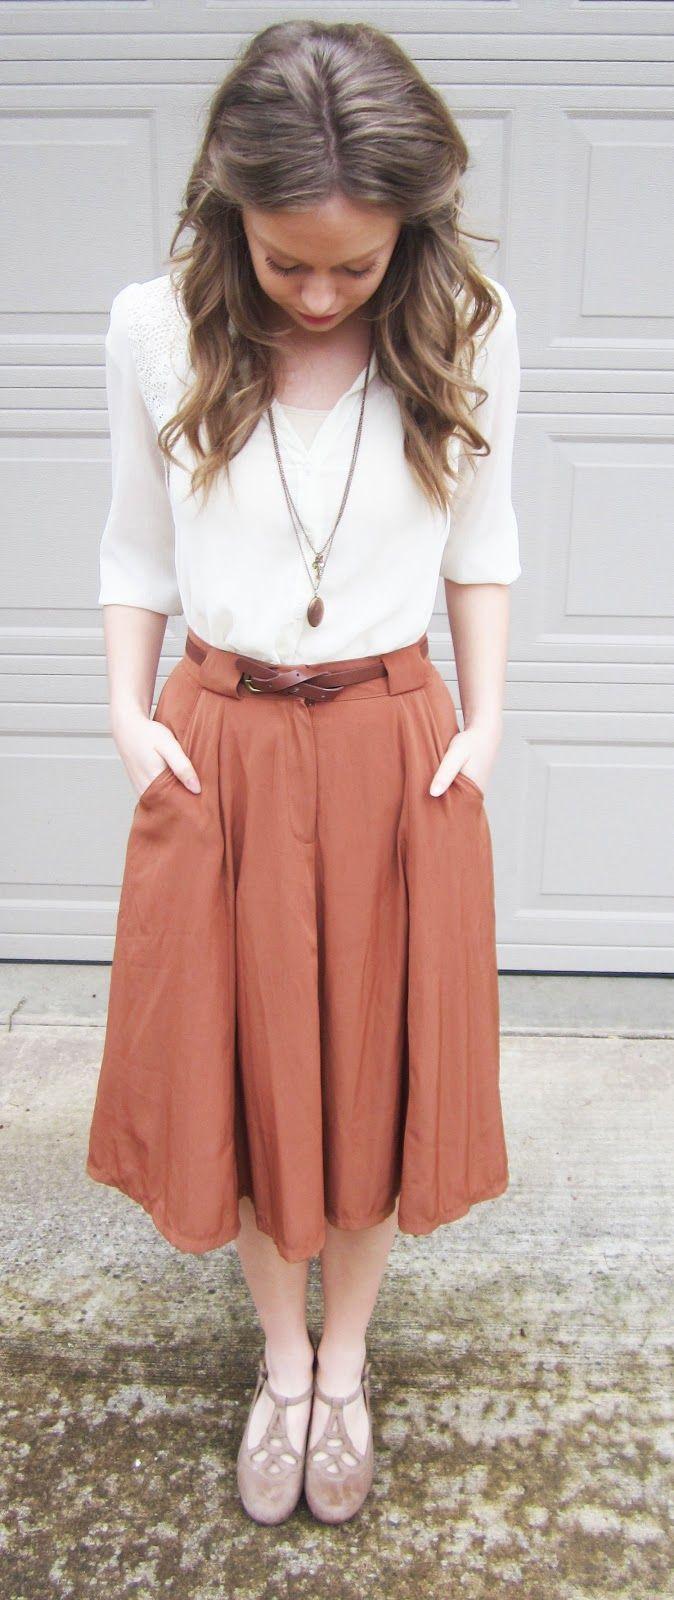 white blouse + pastel midi skirt <3